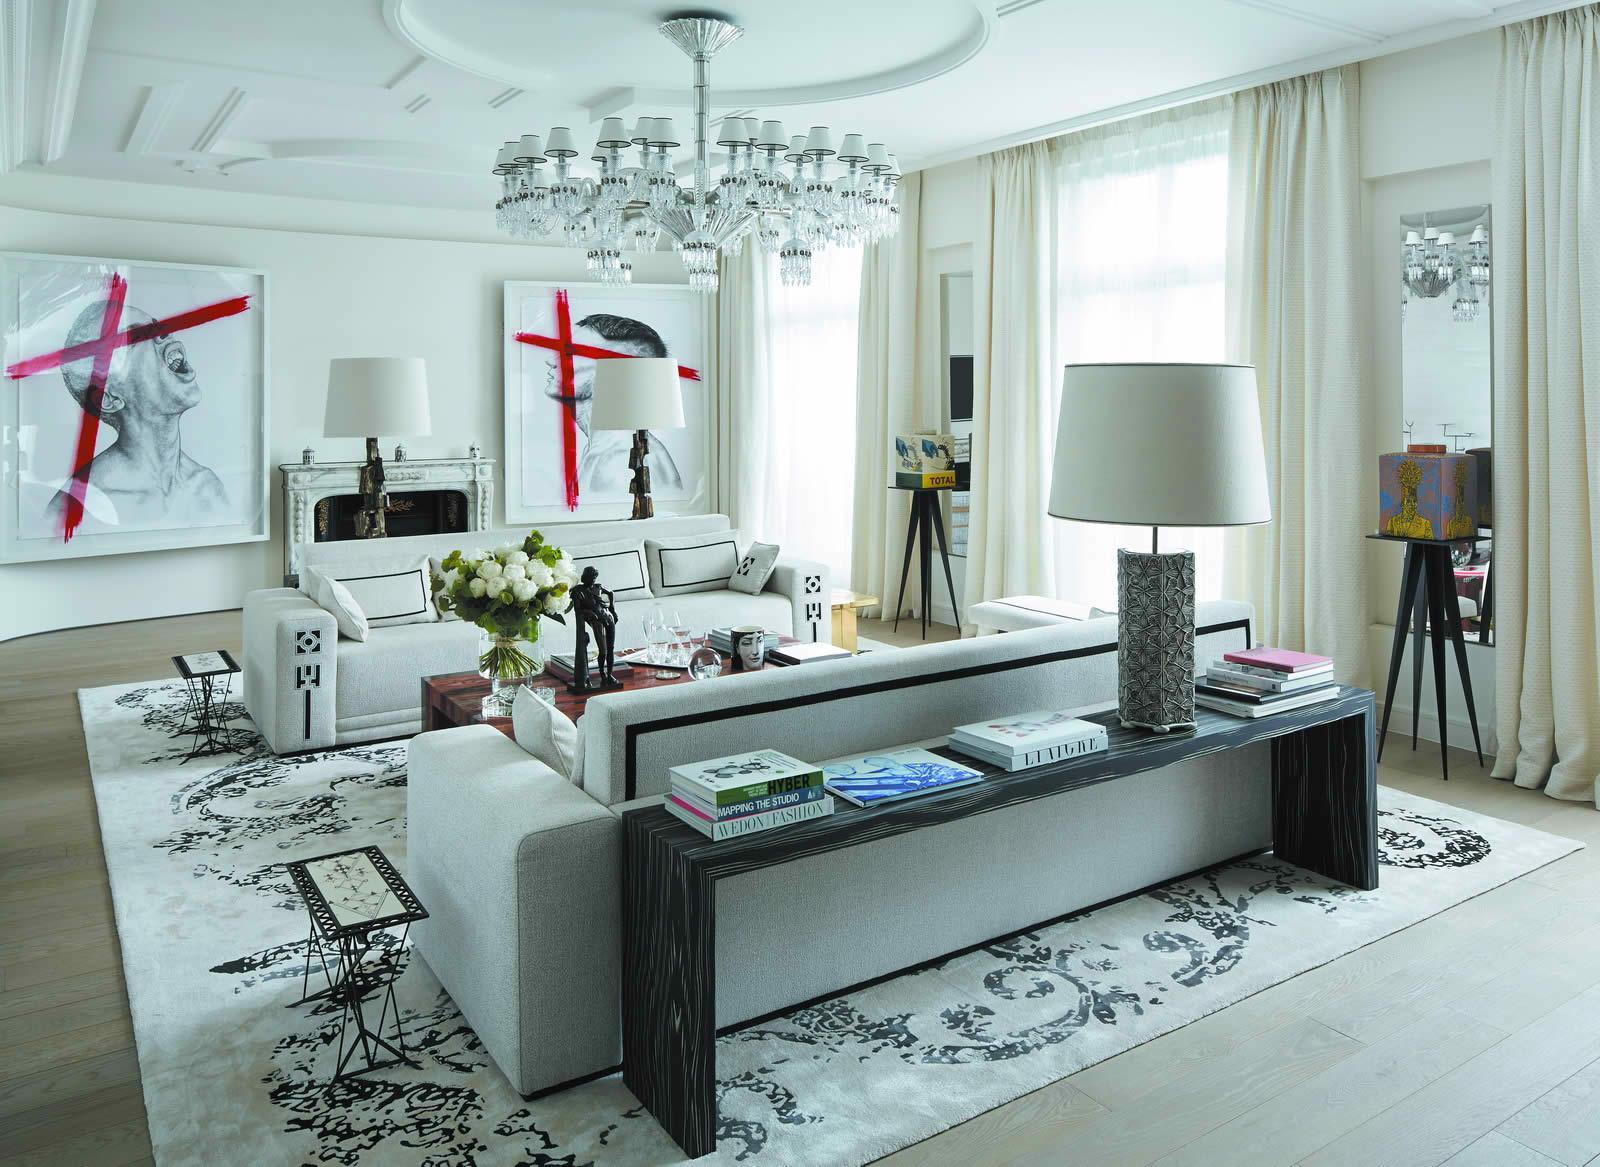 stepahnie-coutas-architecte-interieur-decoratrice-style-minimaliste-01